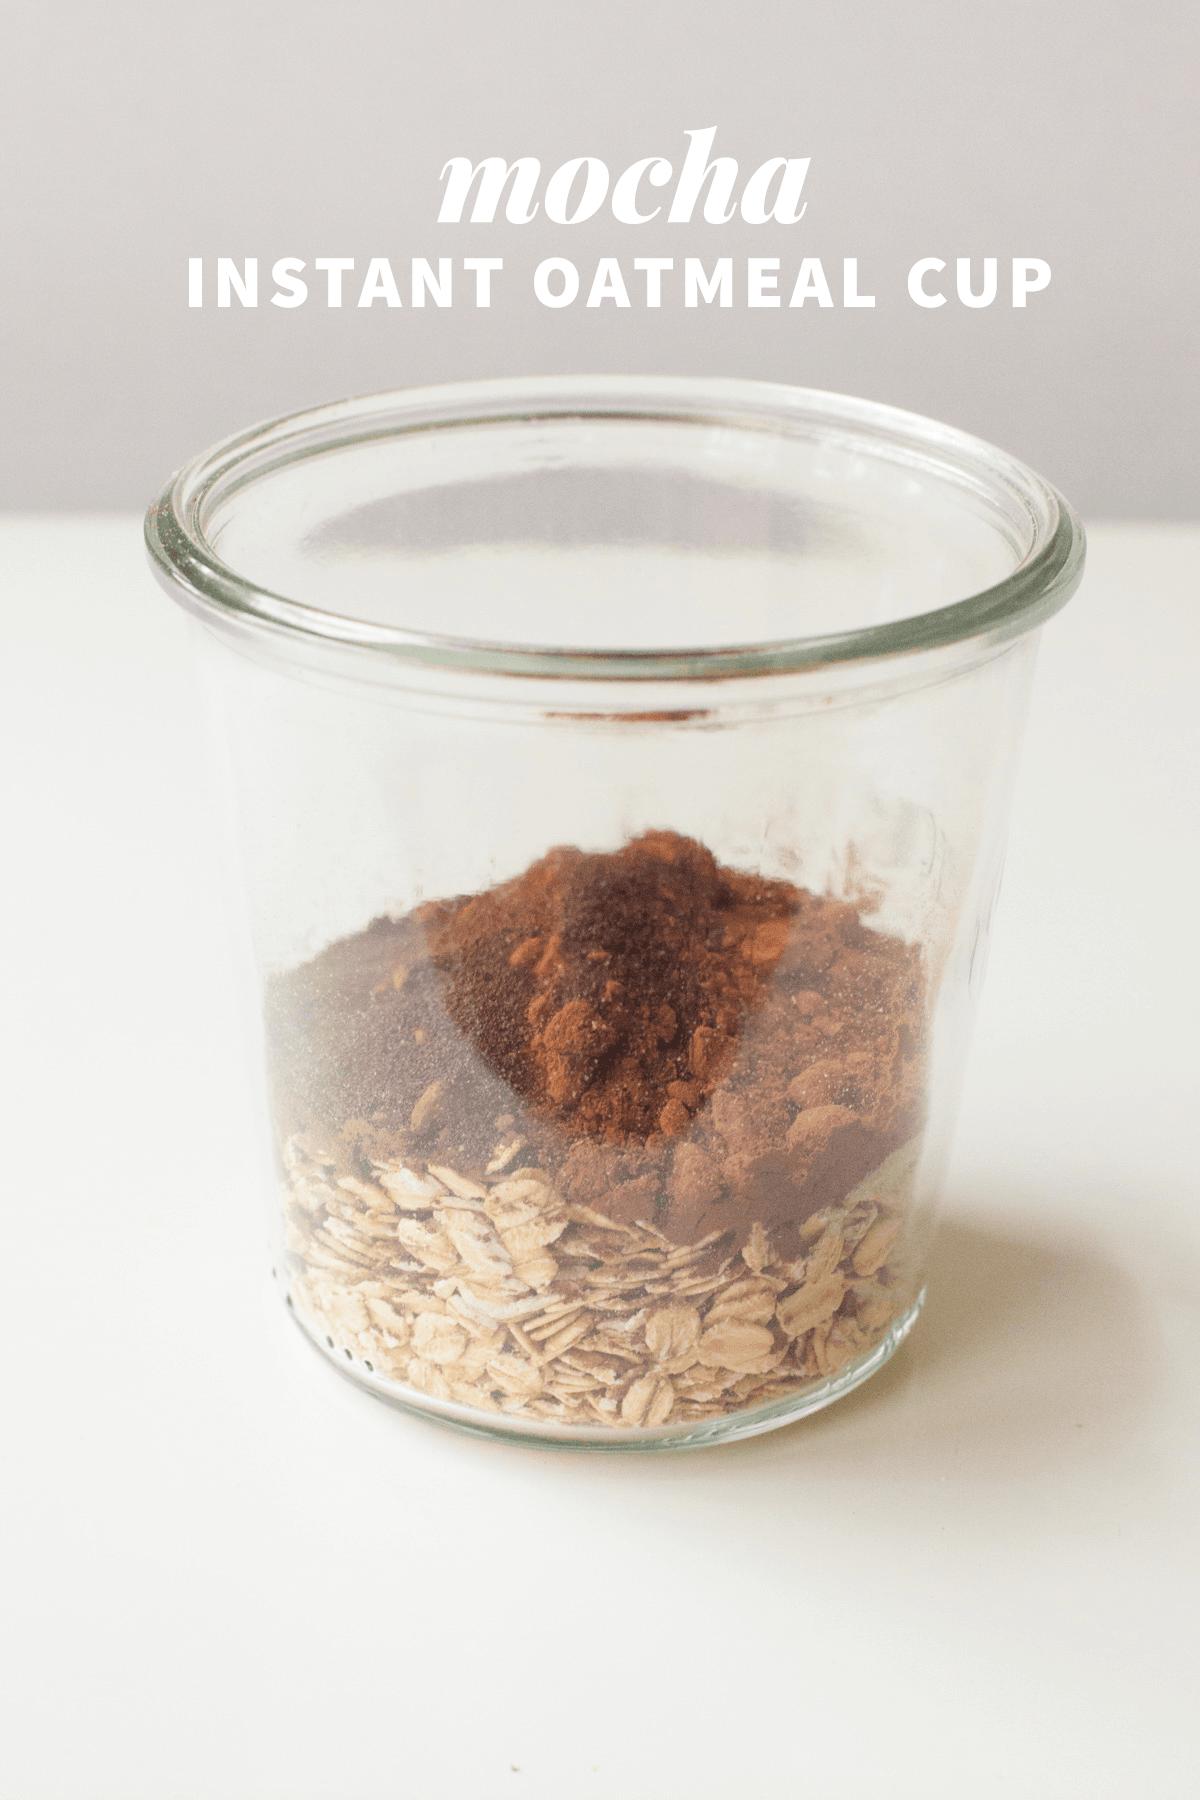 Healthy Instant Oatmeal Cups—Mocha